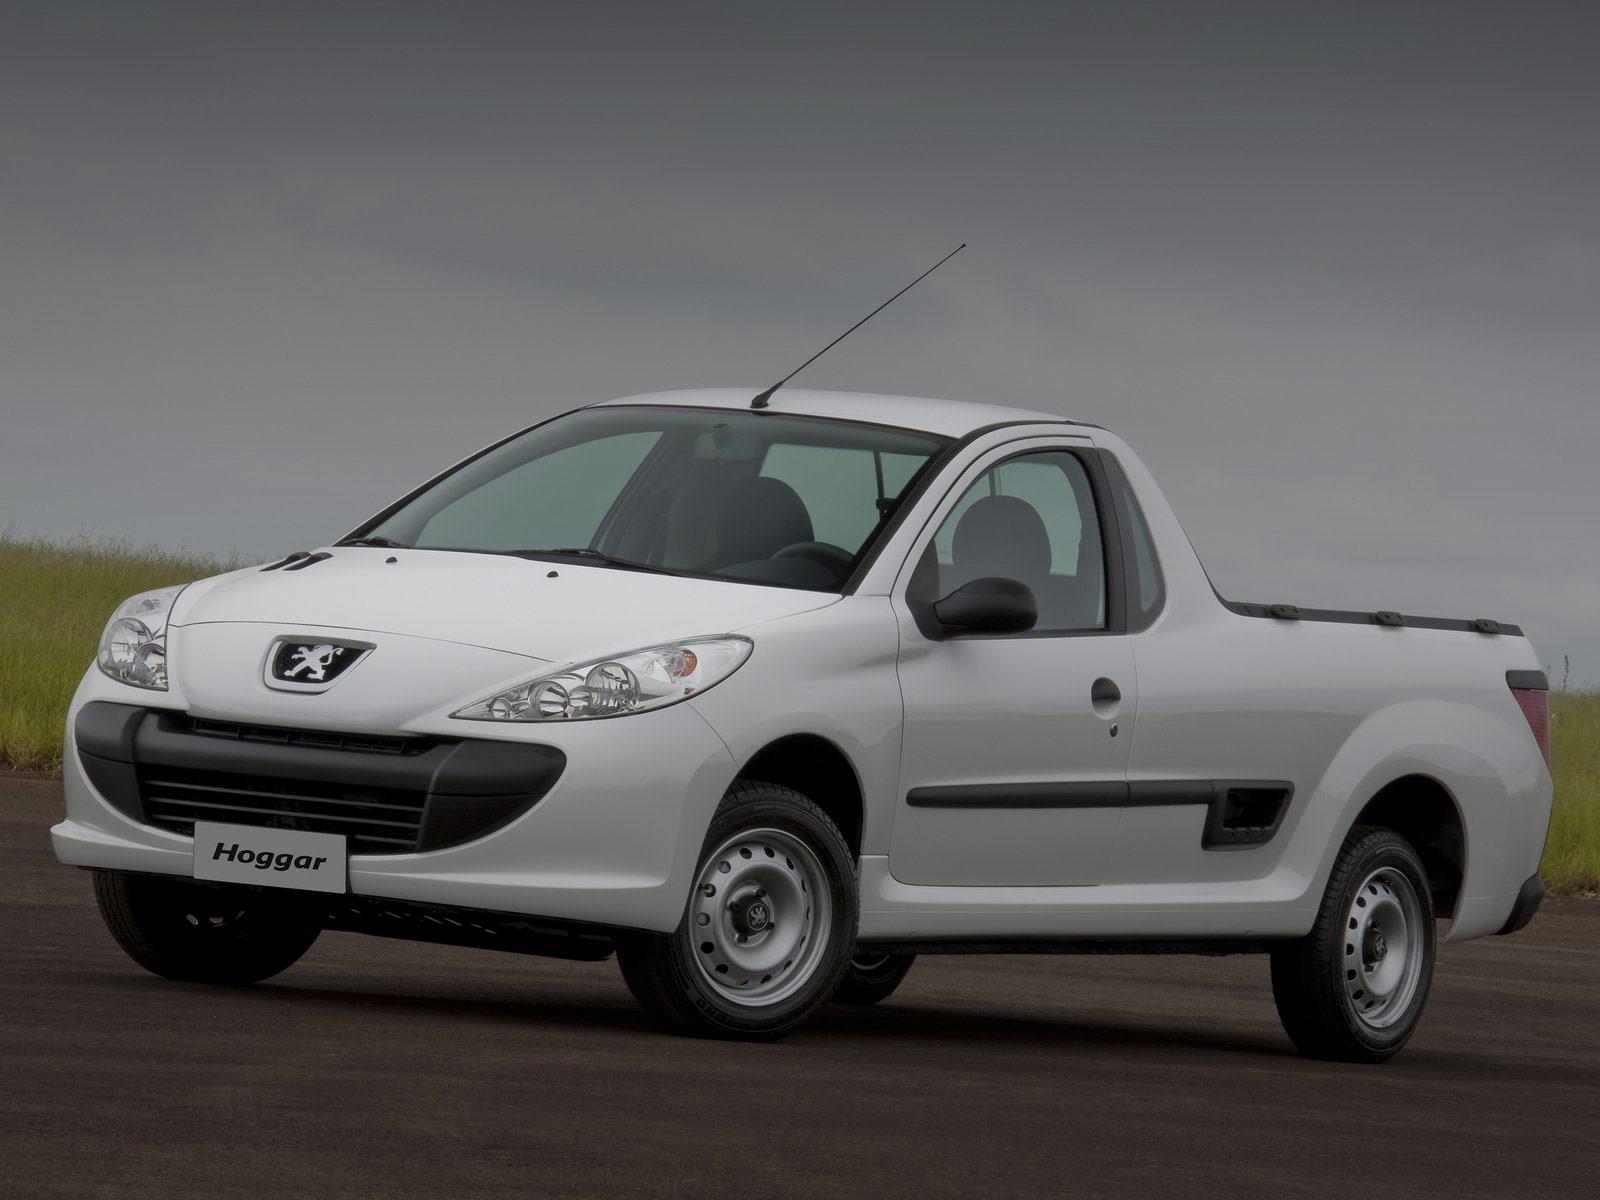 http://1.bp.blogspot.com/_DEP49tusZwg/TKQN4gsEkYI/AAAAAAAABpE/alObMsBv0KI/s1600/Peugeot-Hoggar_2011_03.jpg